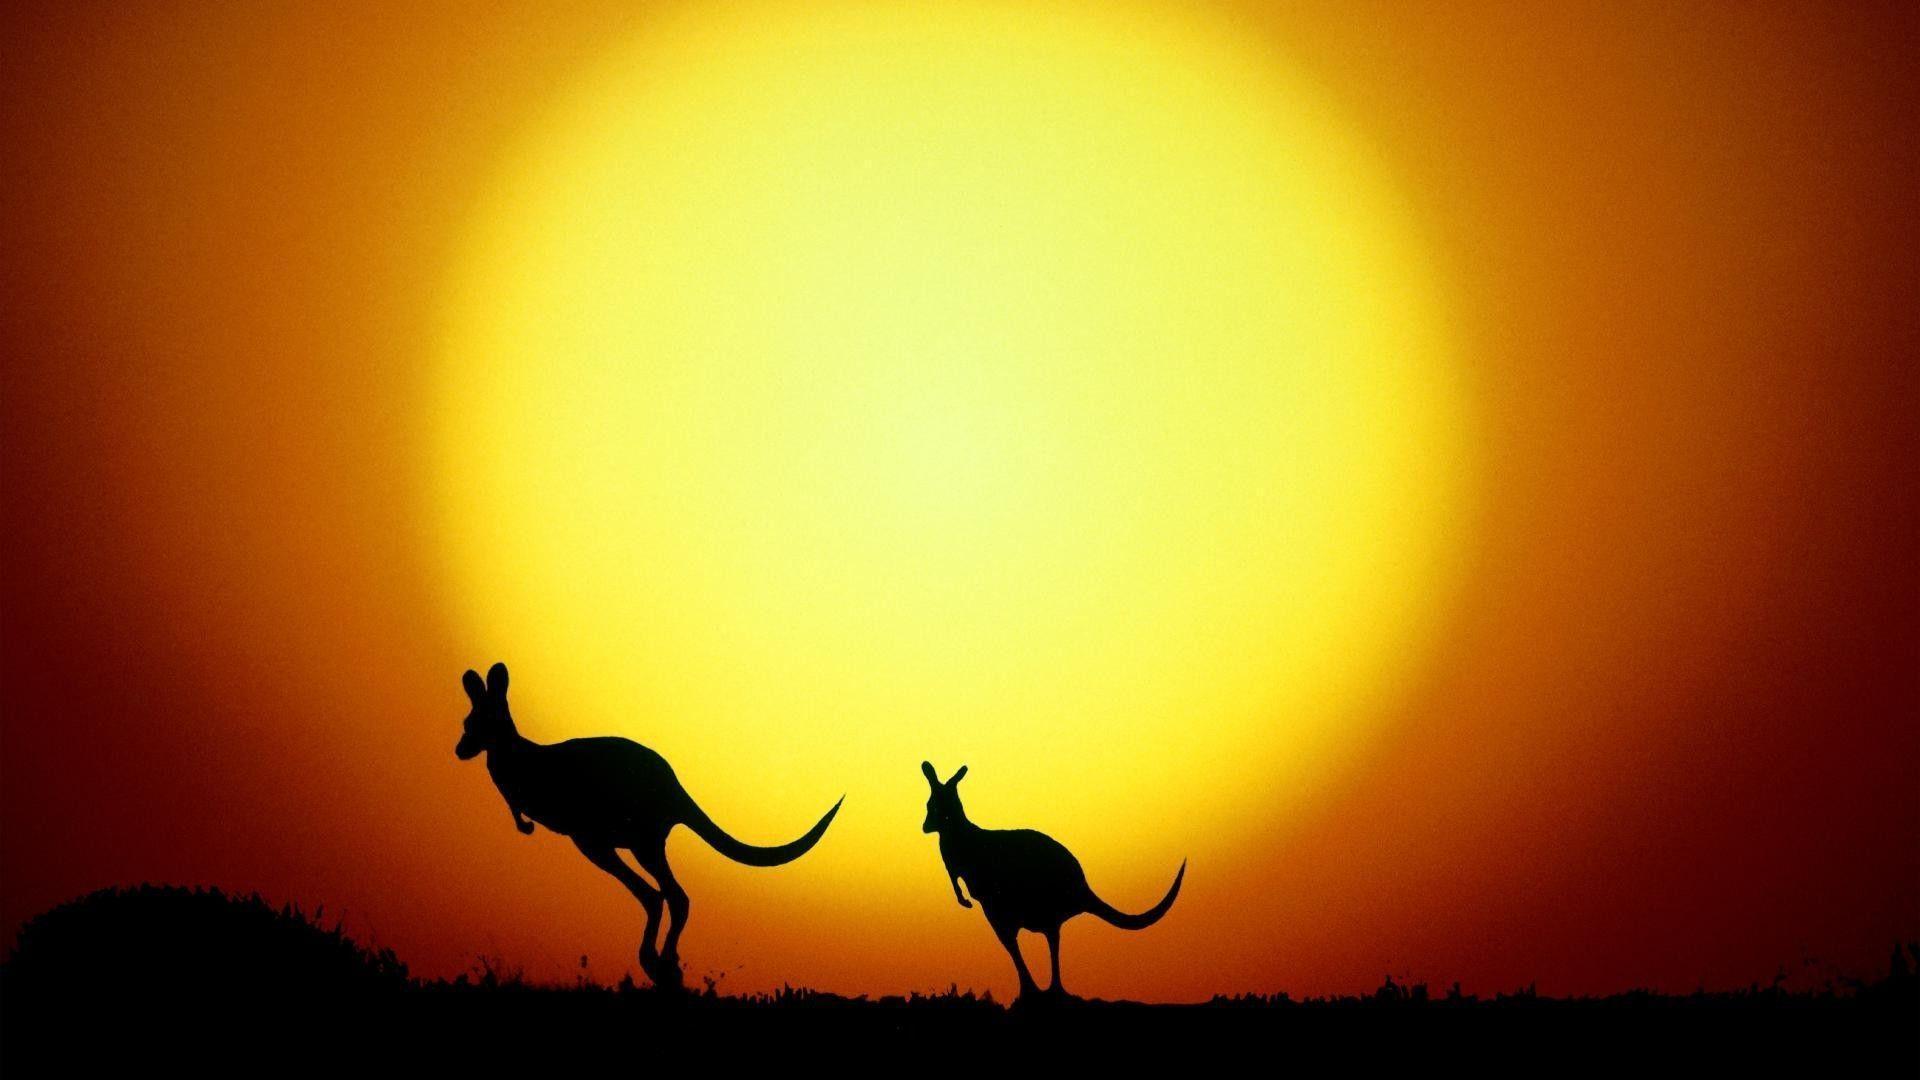 Kangaroo silhouettes Wallpaper #